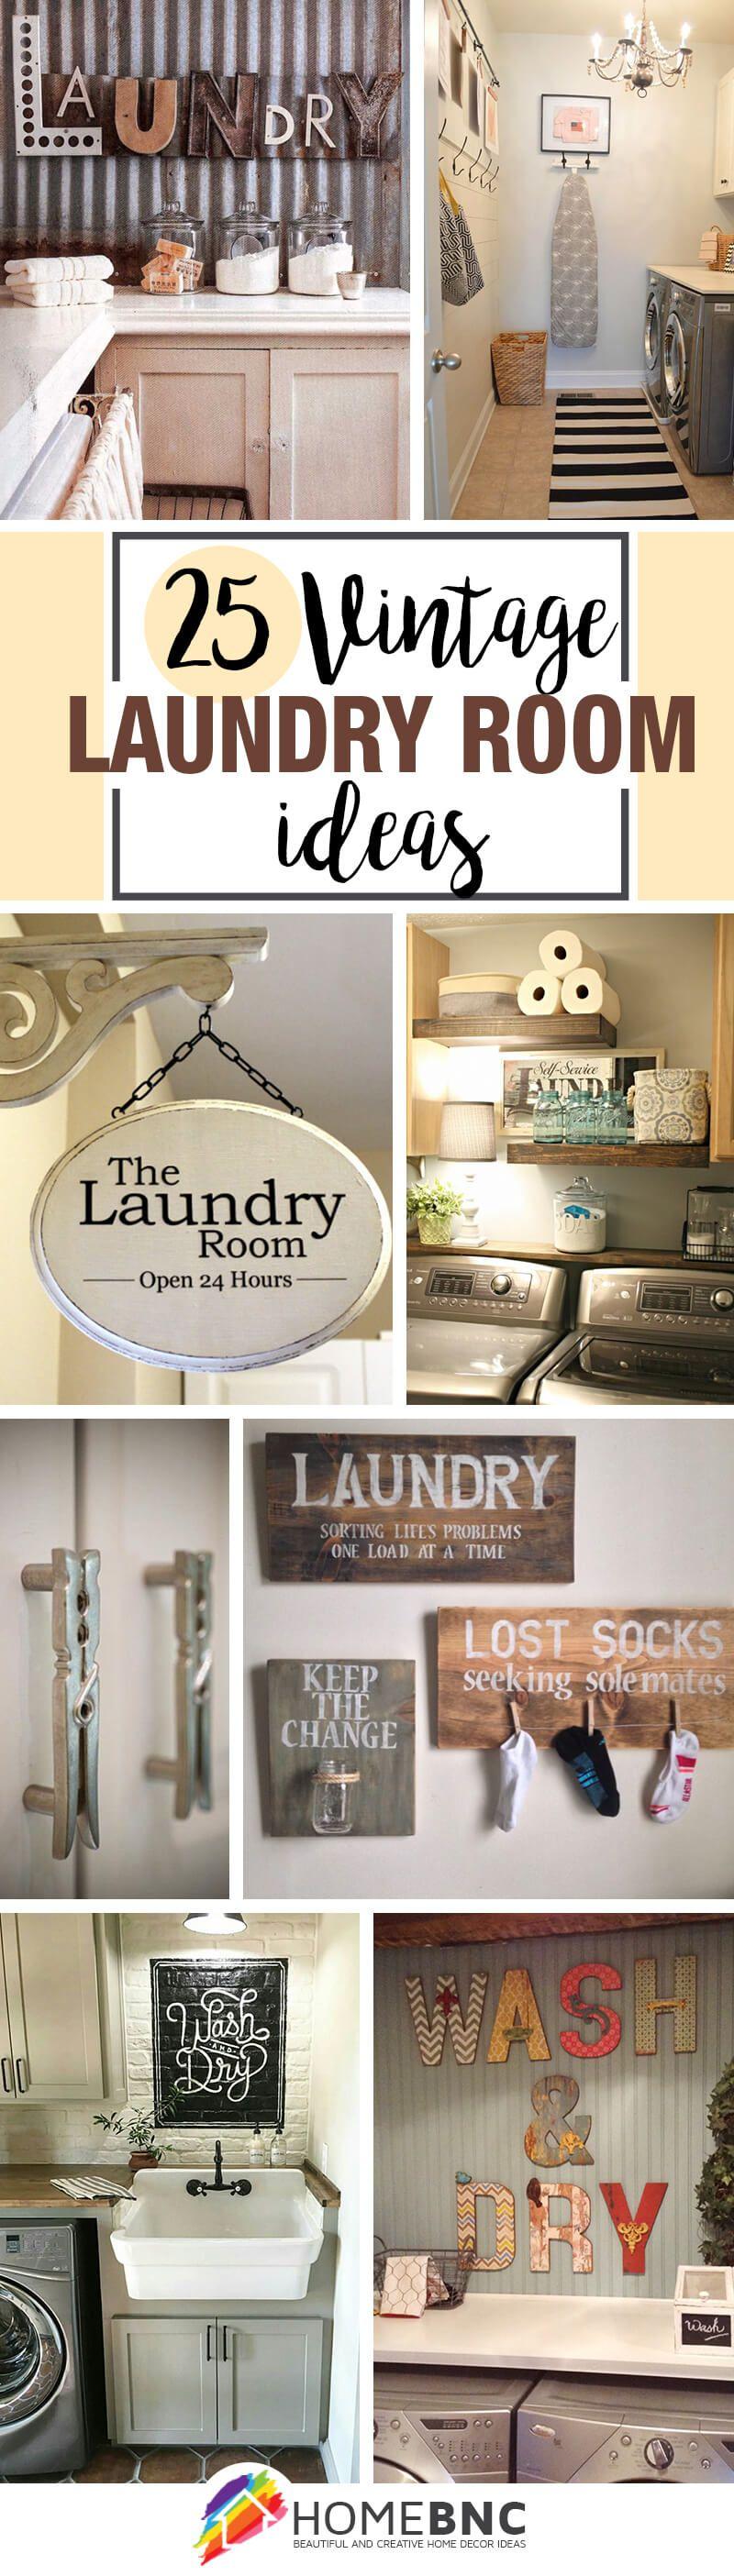 Vintage Laundry Room Signs Impressive 25 Ways To Give Your Laundry Room A Vintage Makeover  Vintage Design Ideas